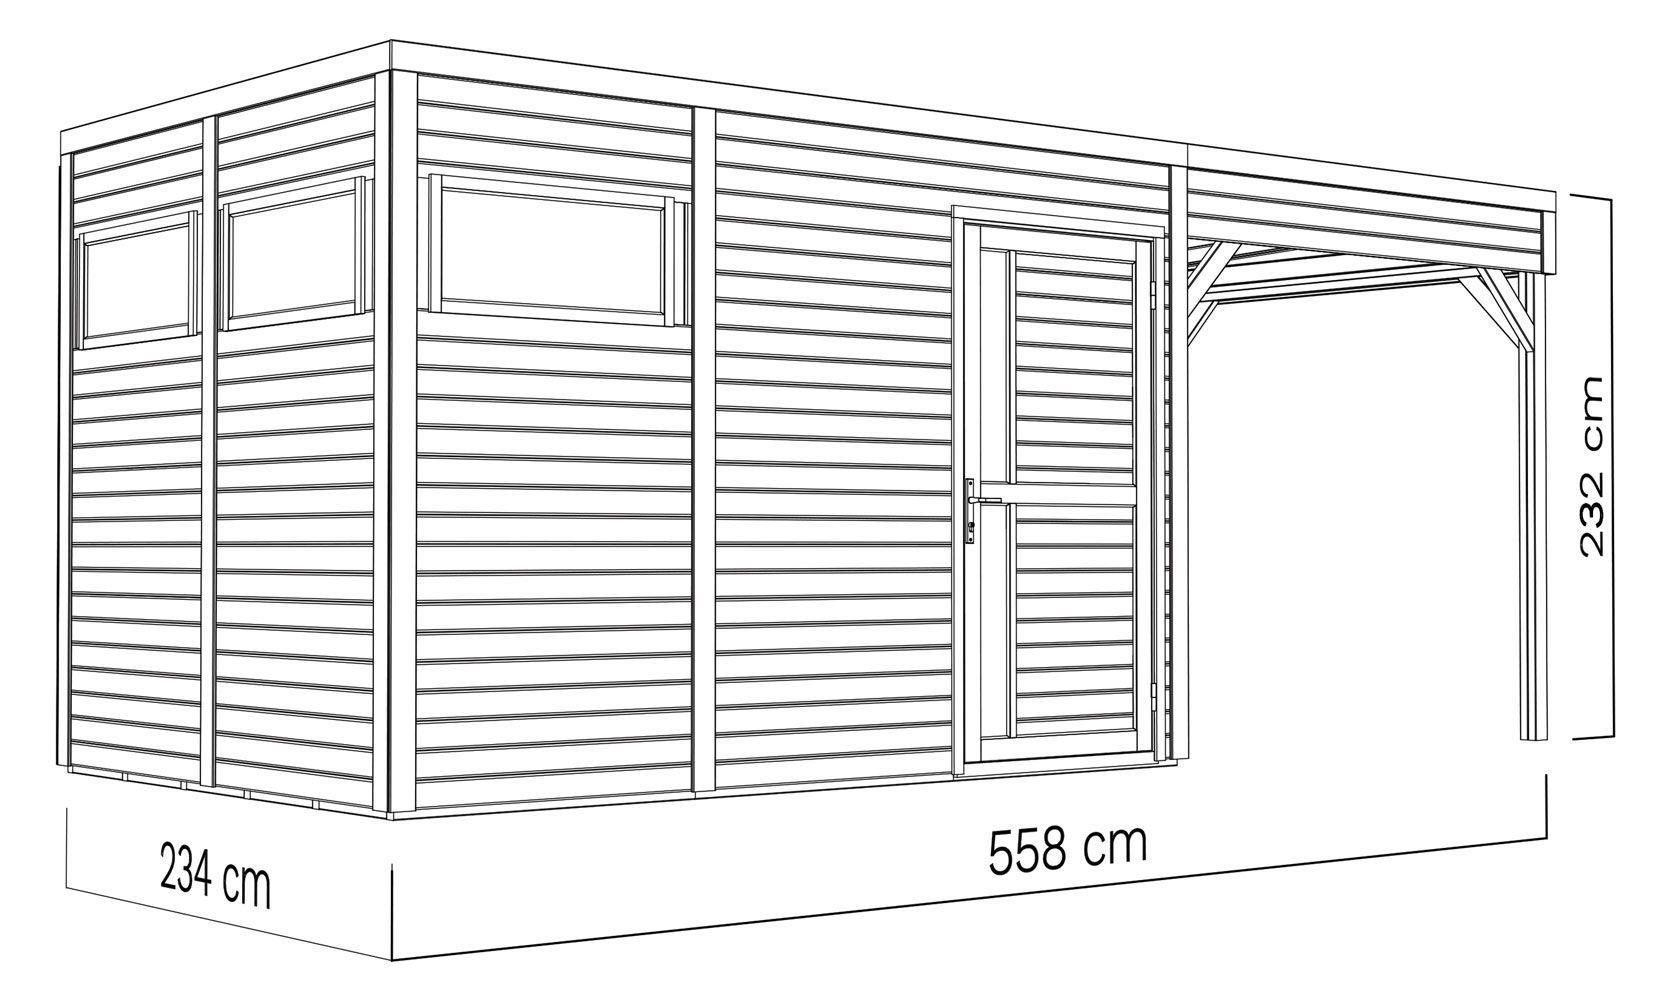 Element Gartenhaus Mit Flachdach Inkl Uberdachtem Anbau Fussboden Und Dachpappe Naturbelassen 19 Mm Nutzflache 7 70 M In 2021 Gartenhaus Flachdach Dachpappe